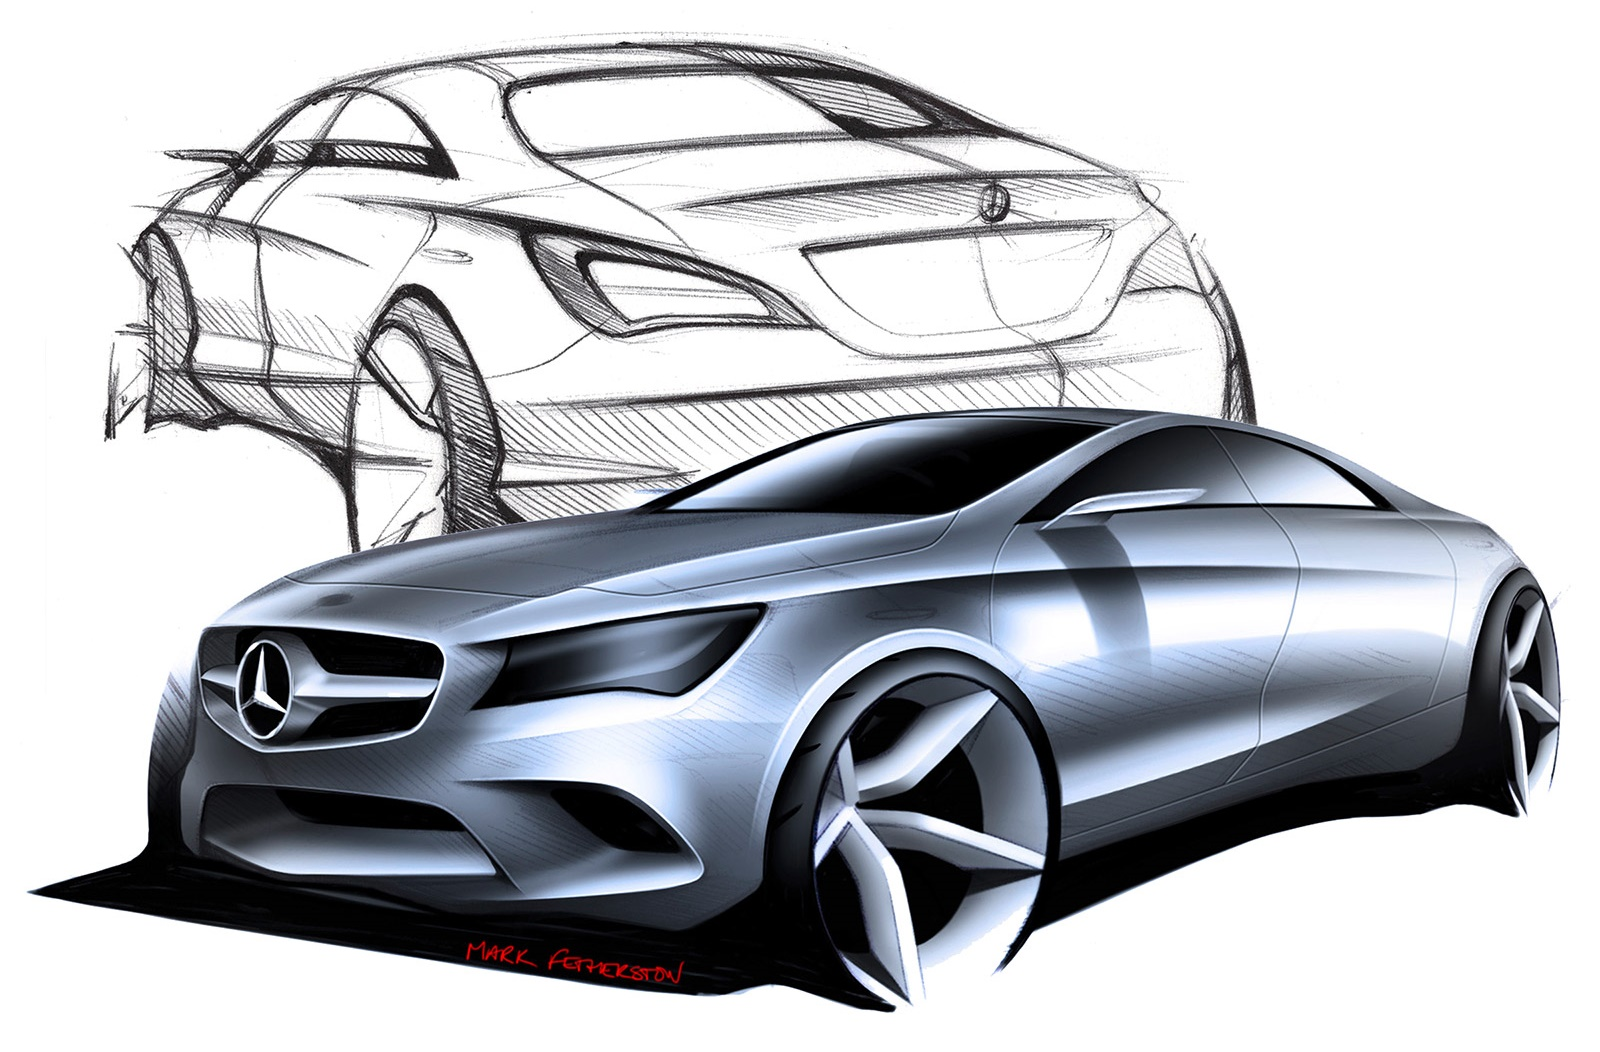 BMW i Mercedes uvode smireniji dizajn, Lexus agresivniji